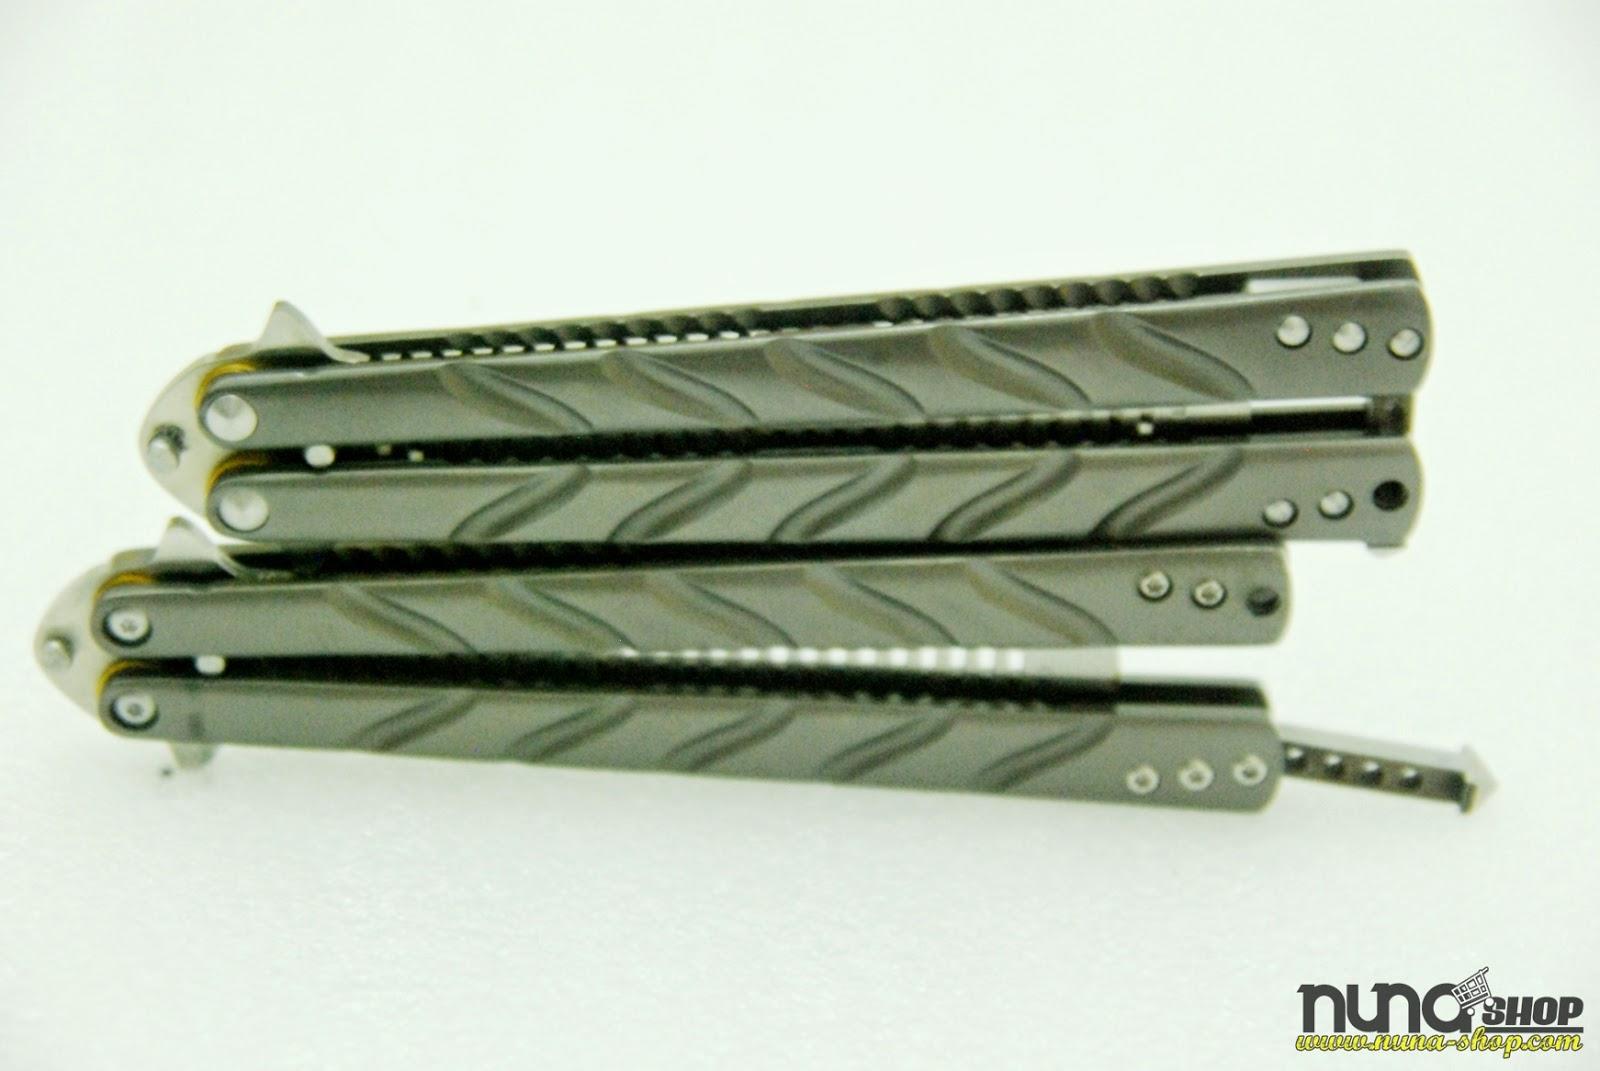 Toko Online Jual Muarah Balisong Butterfly Comb MTech